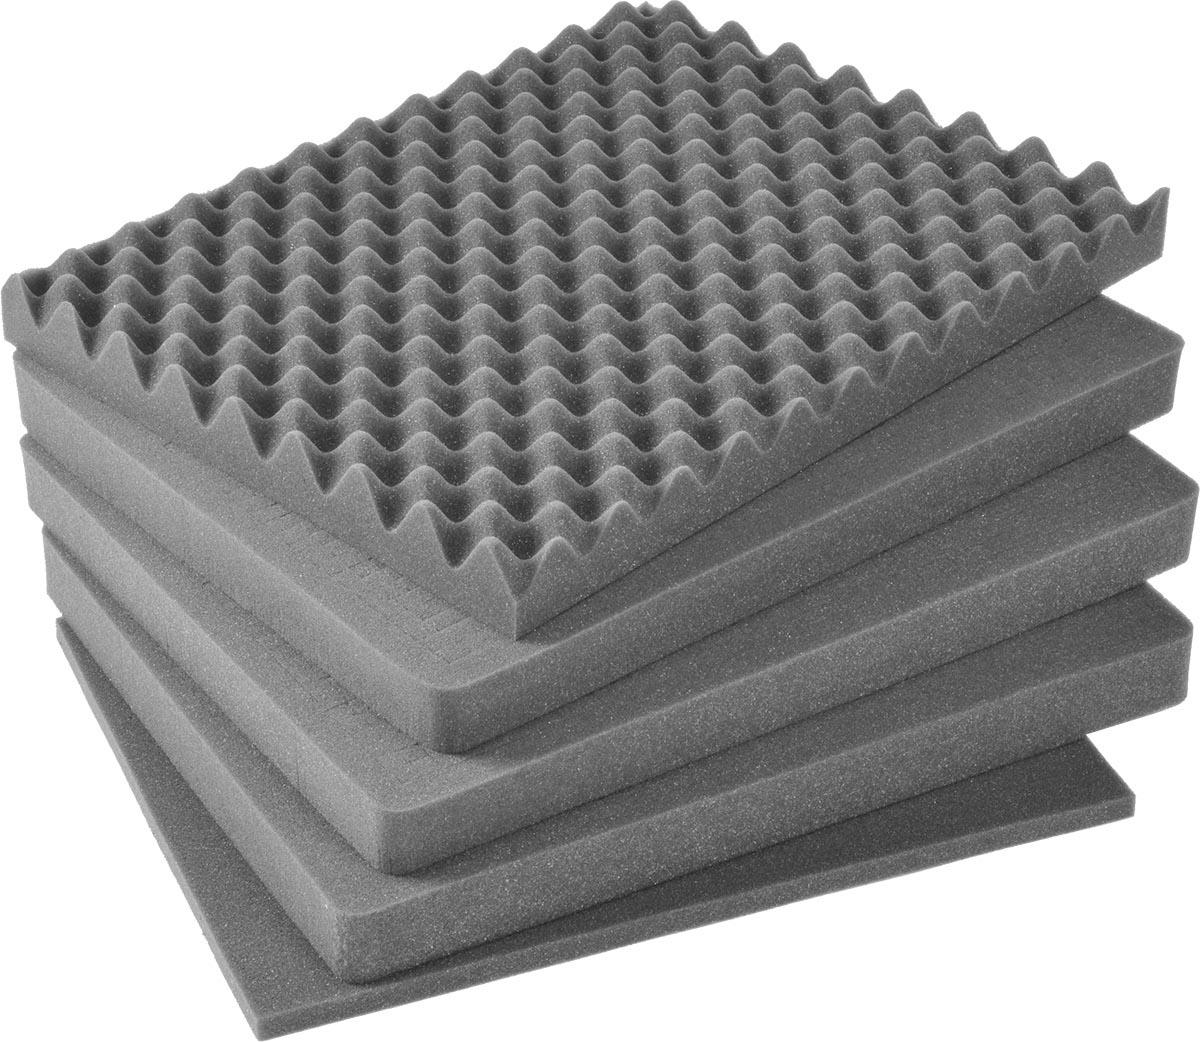 pelican im2700 foam replacement set